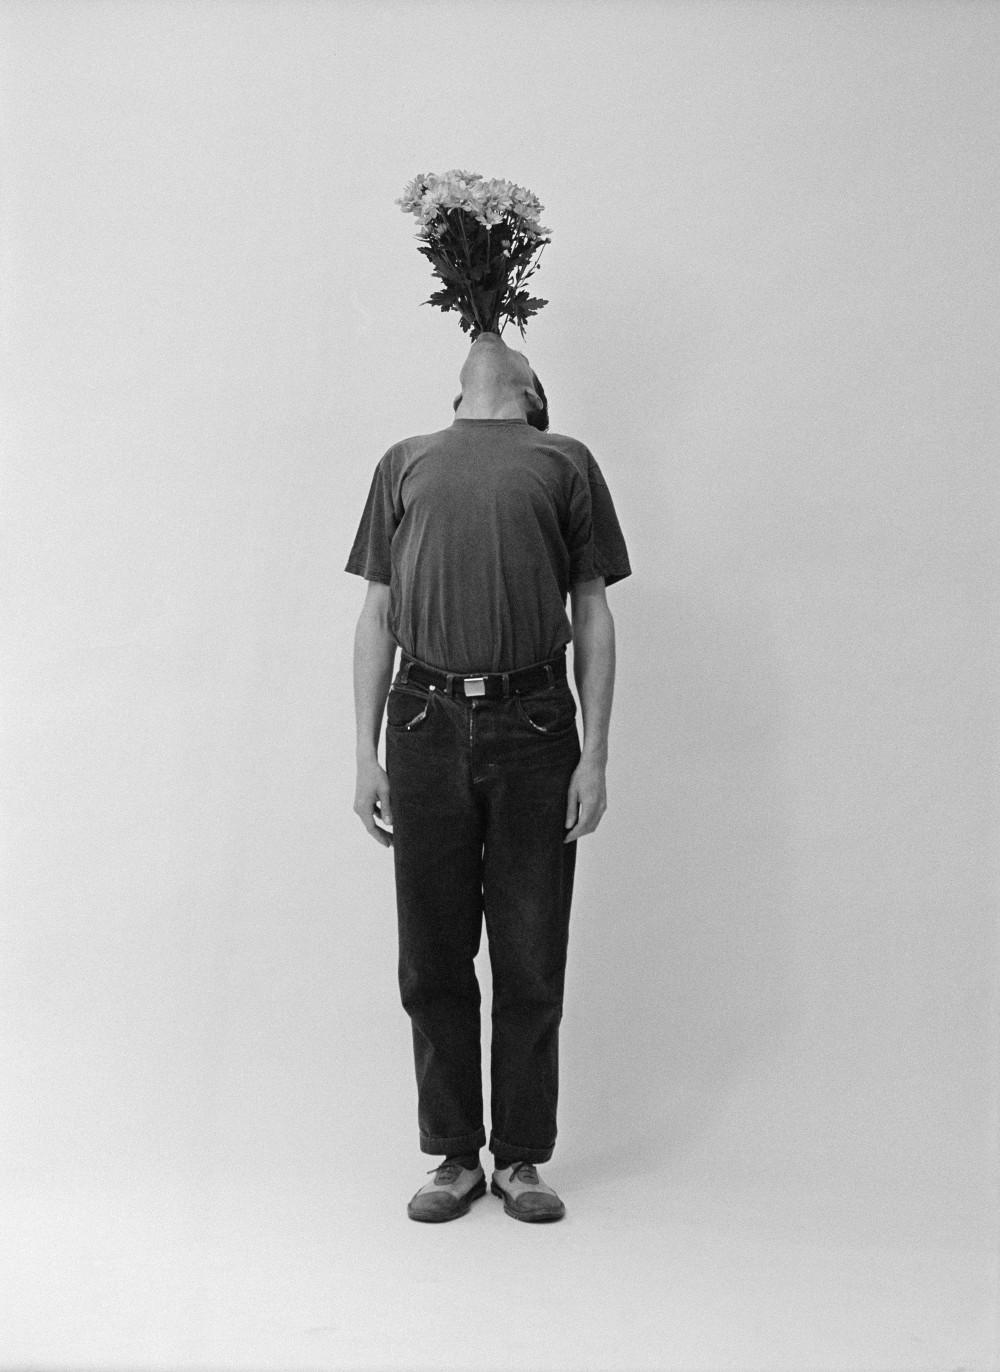 Homme Vase - © Pierre Charpin